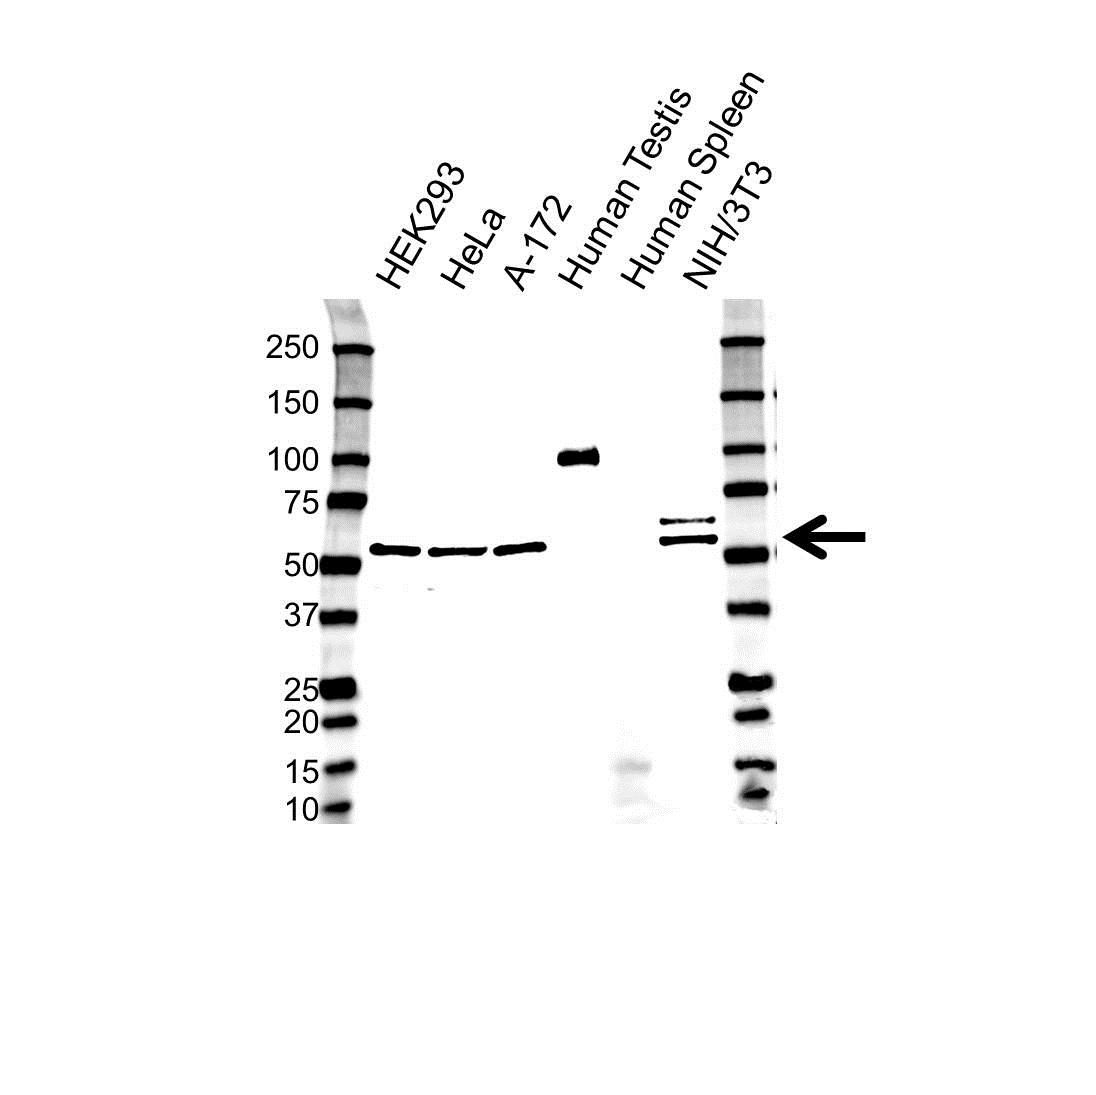 Anti COP9 Signalosome Complex Subunit 1 Antibody (PrecisionAb Polyclonal Antibody) gallery image 1